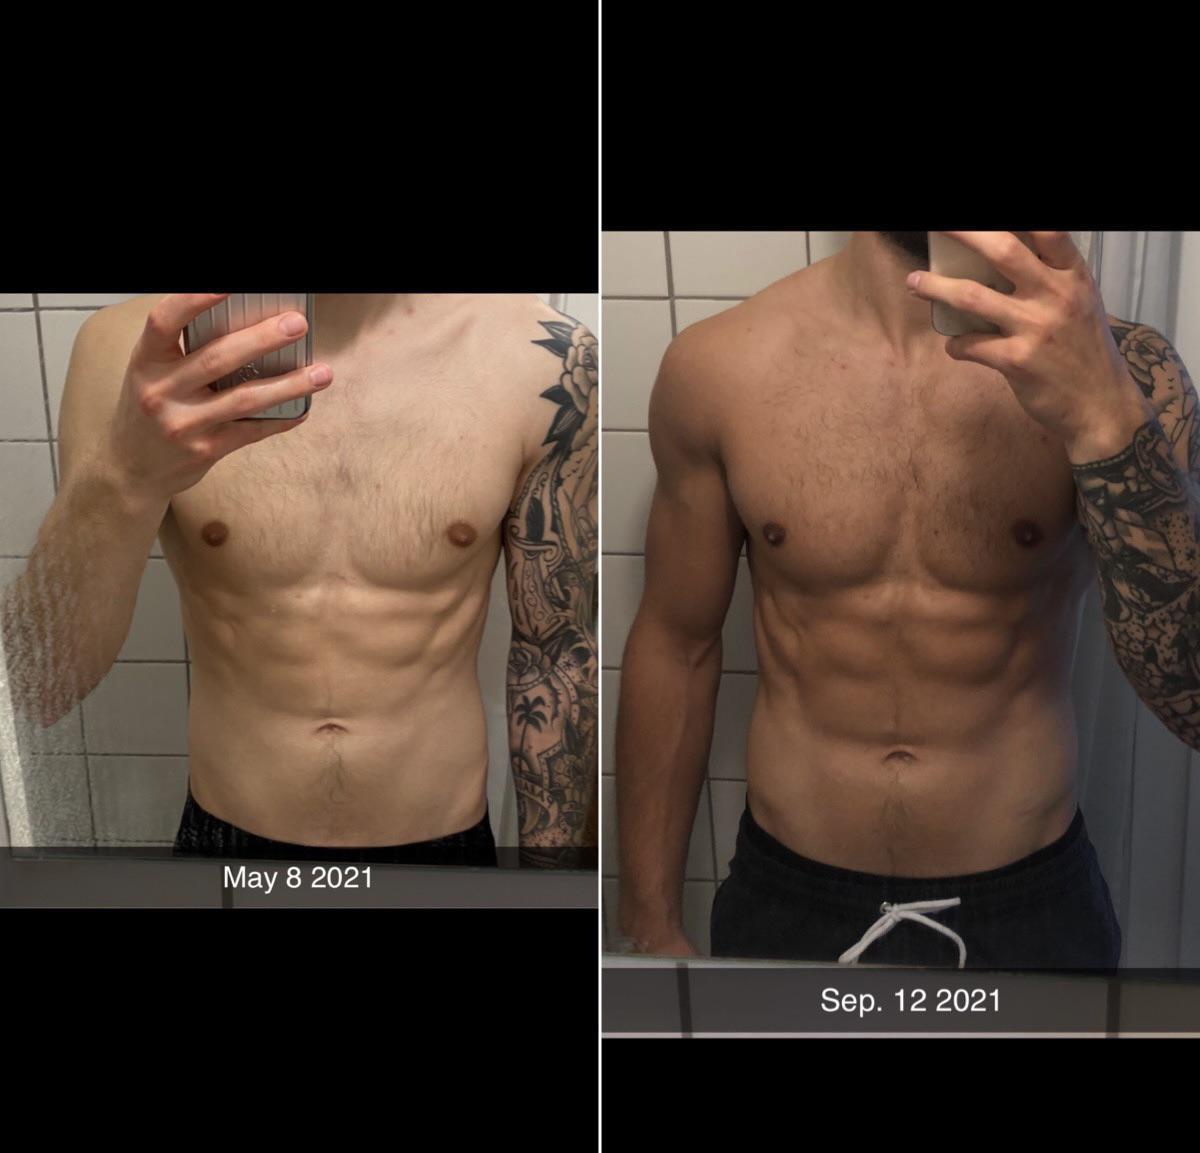 Progress Pics of 8 lbs Weight Gain 5 feet 9 Male 136 lbs to 144 lbs